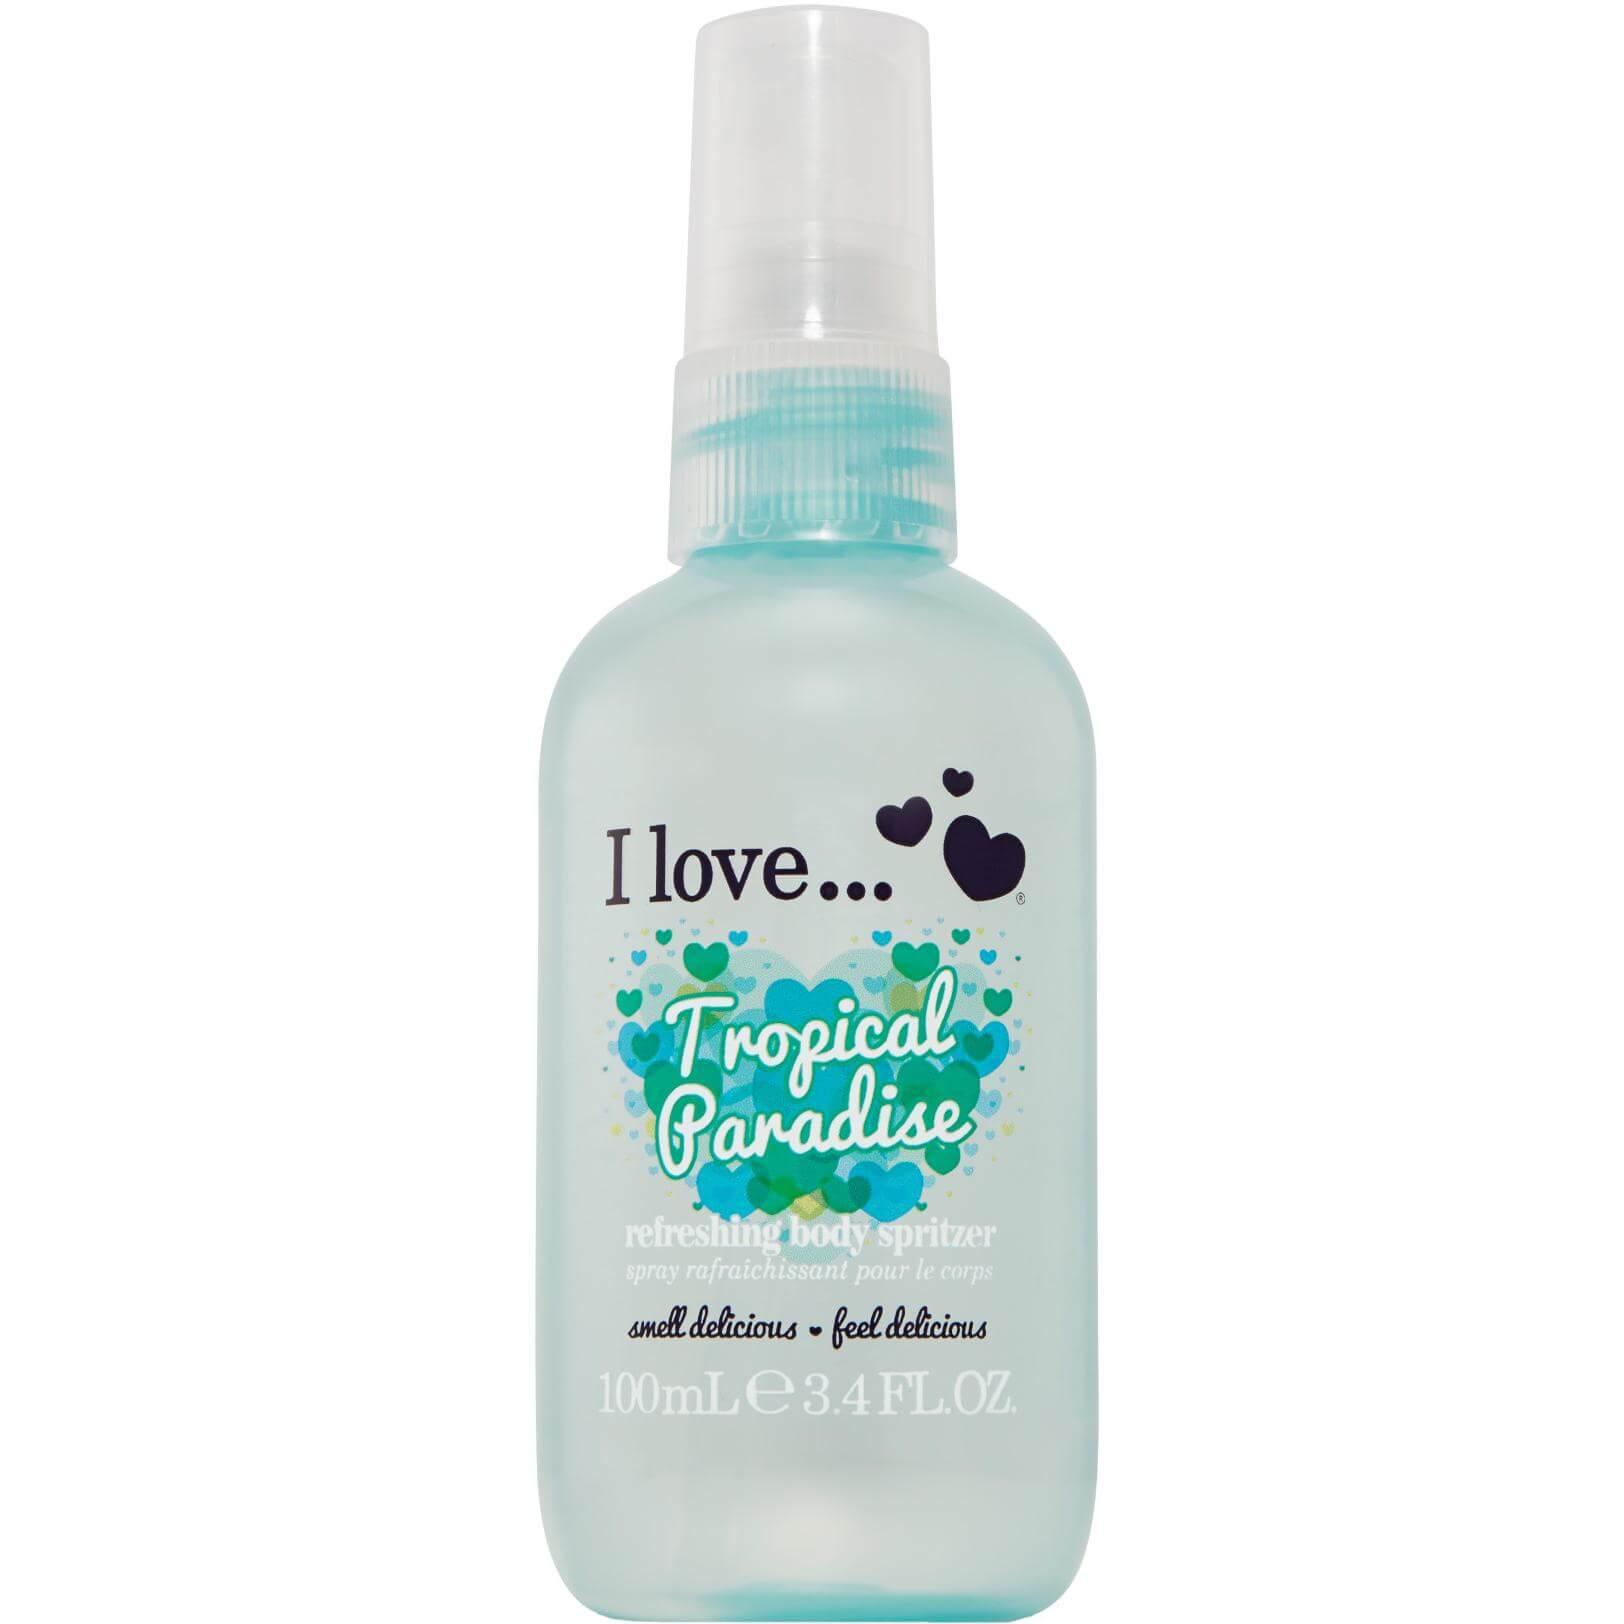 I love… Refreshing Body Spritzer Άρωμα Σώματος 100ml – Tropical Paradise